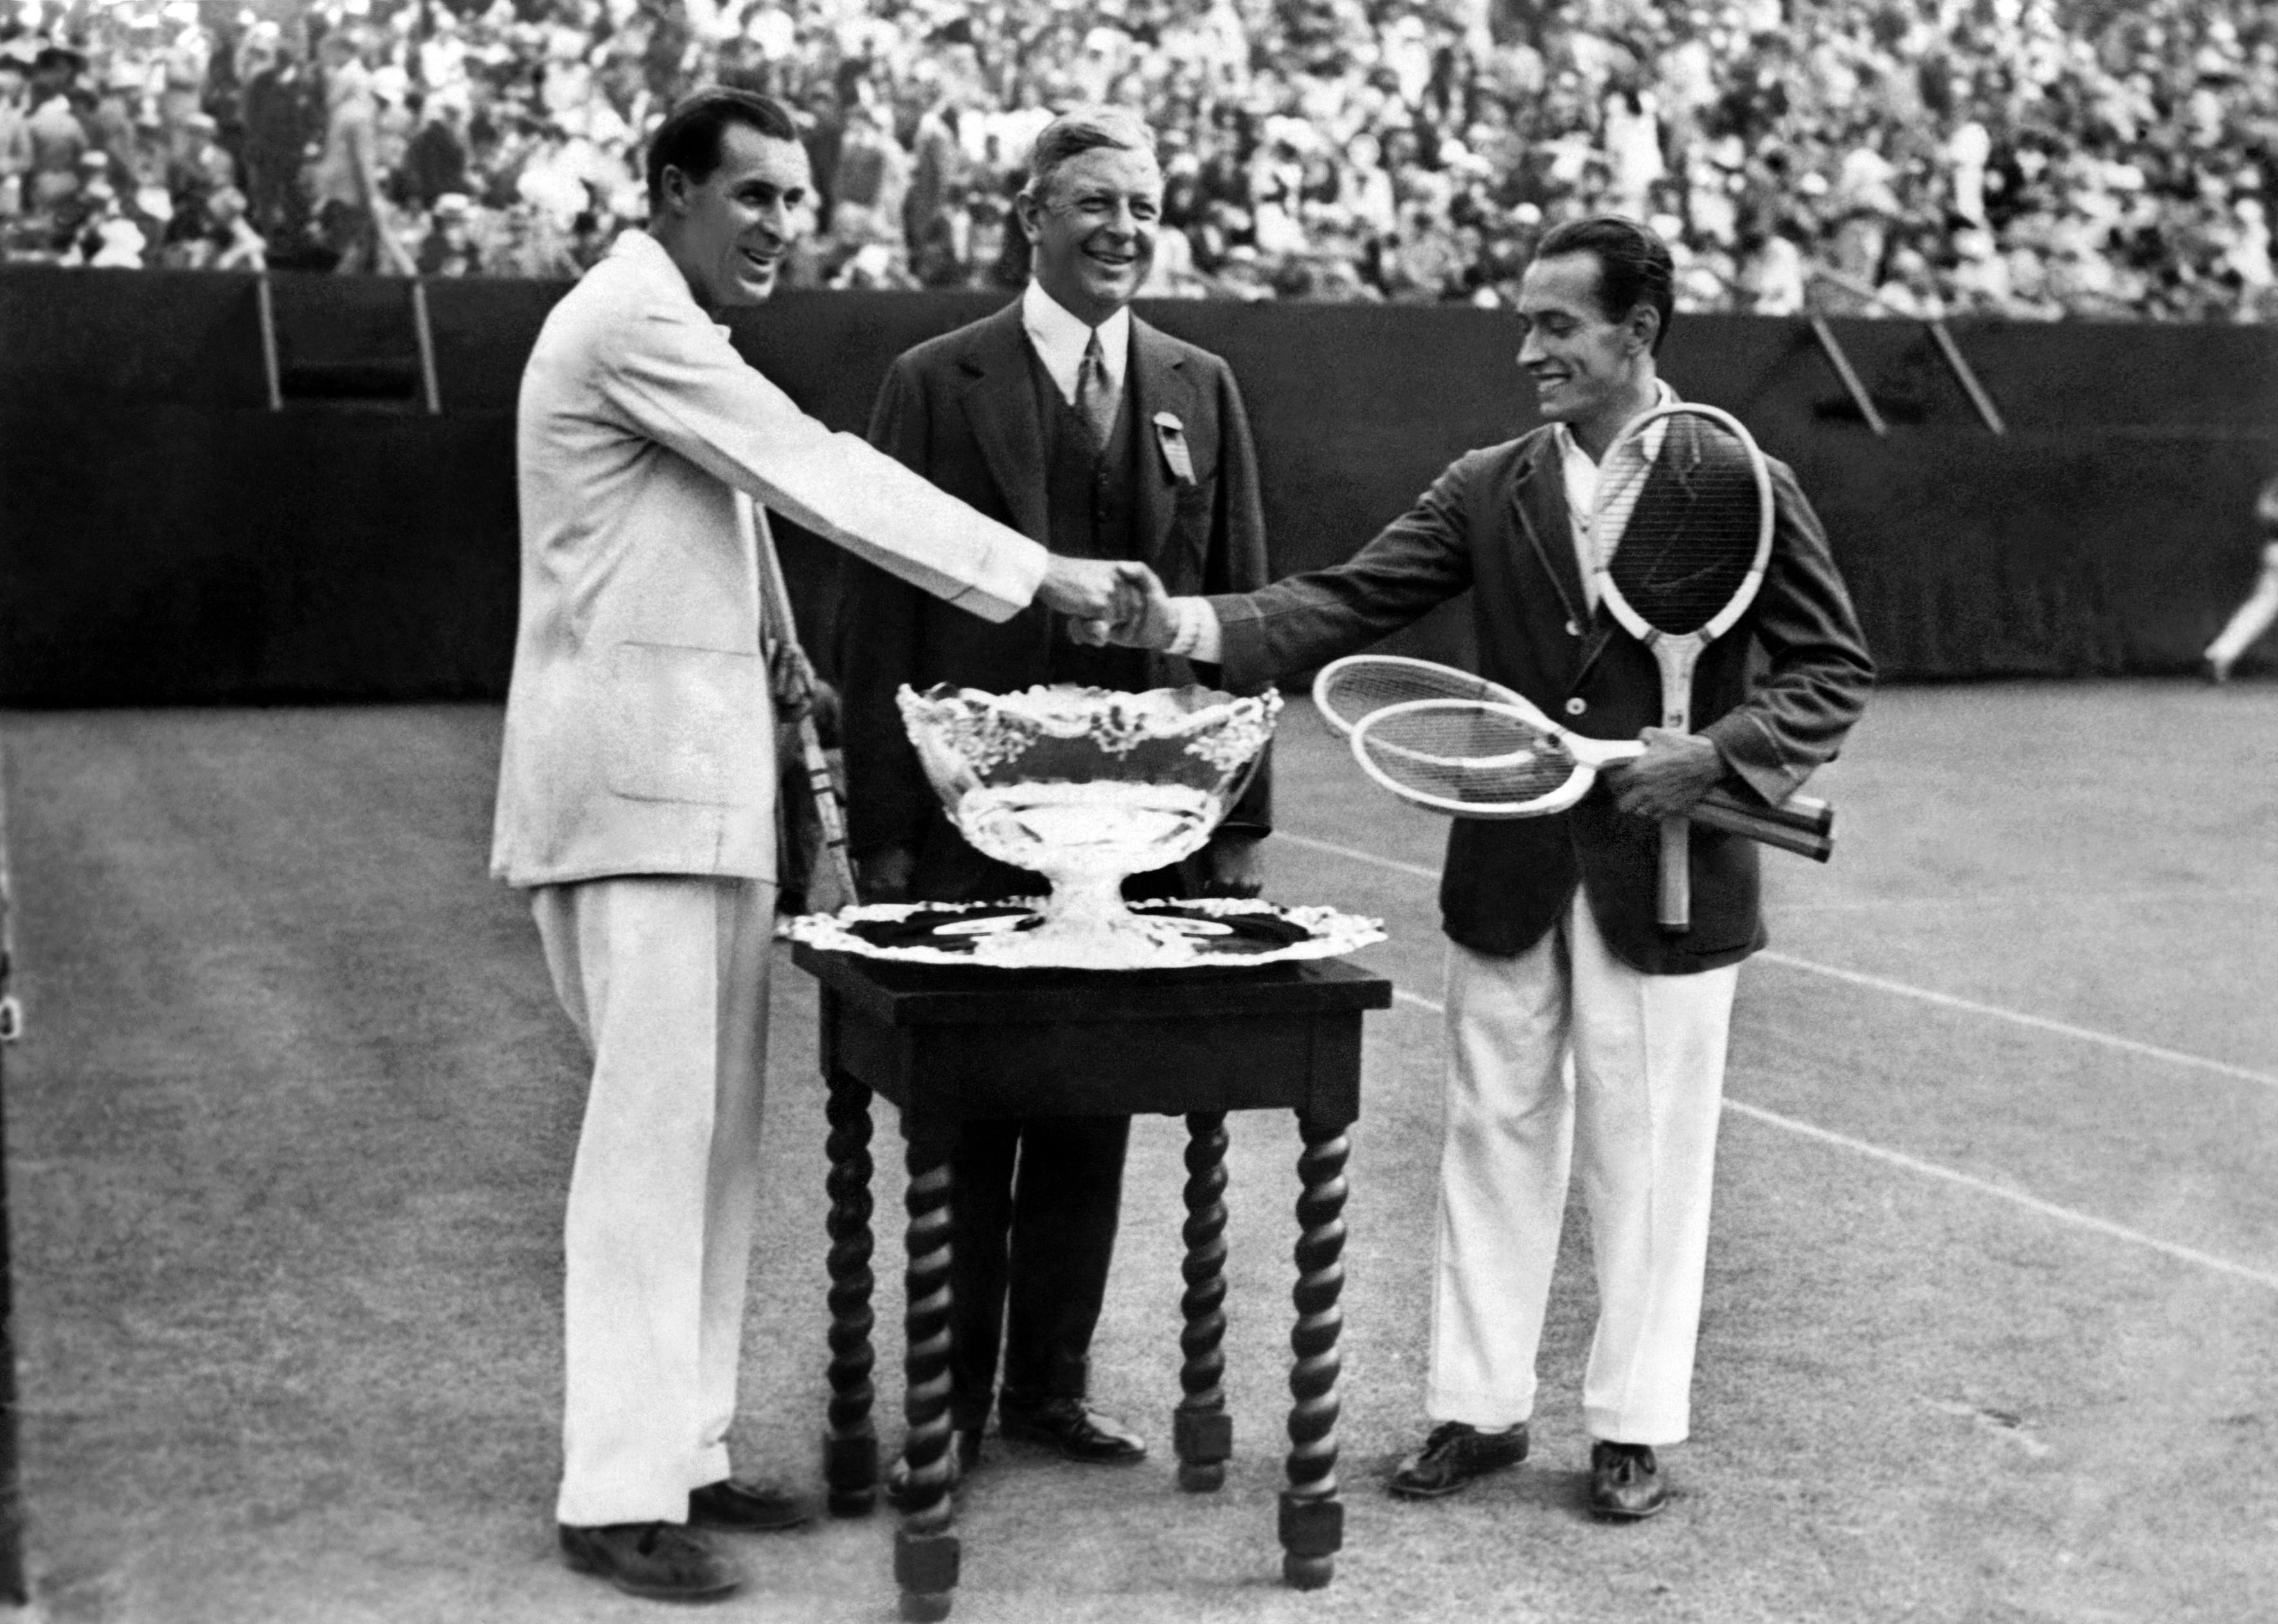 Билл Тилден (слева) и Анри Коше на матче Кубка Дэвиса (1926)